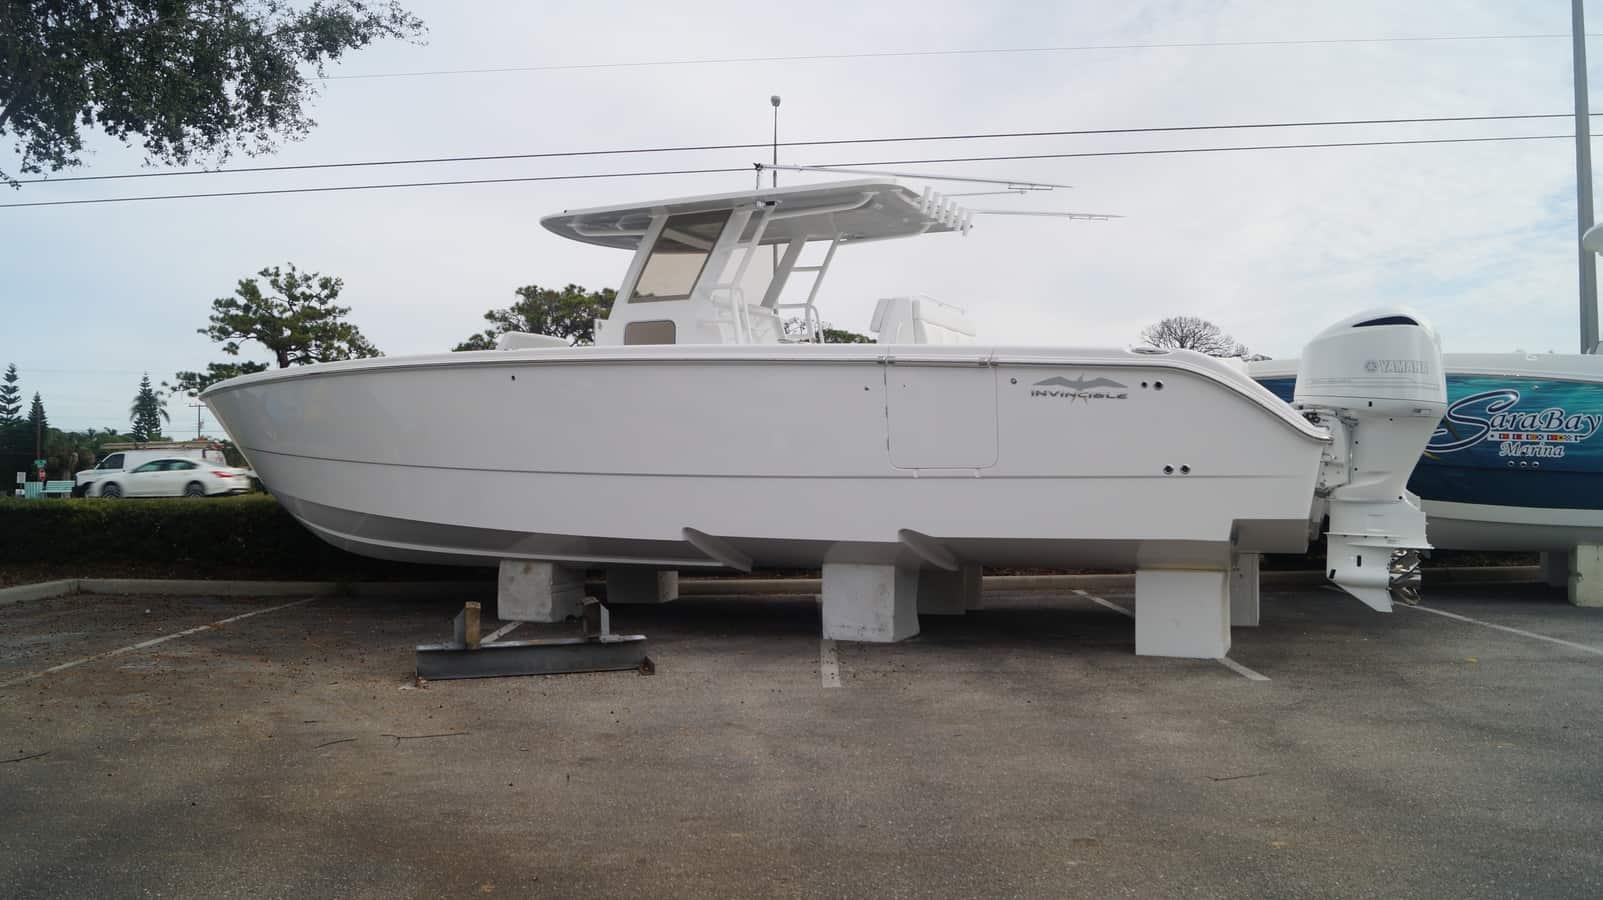 NEW 2019 Invincible 37 Catamaran - Sara Bay Marina